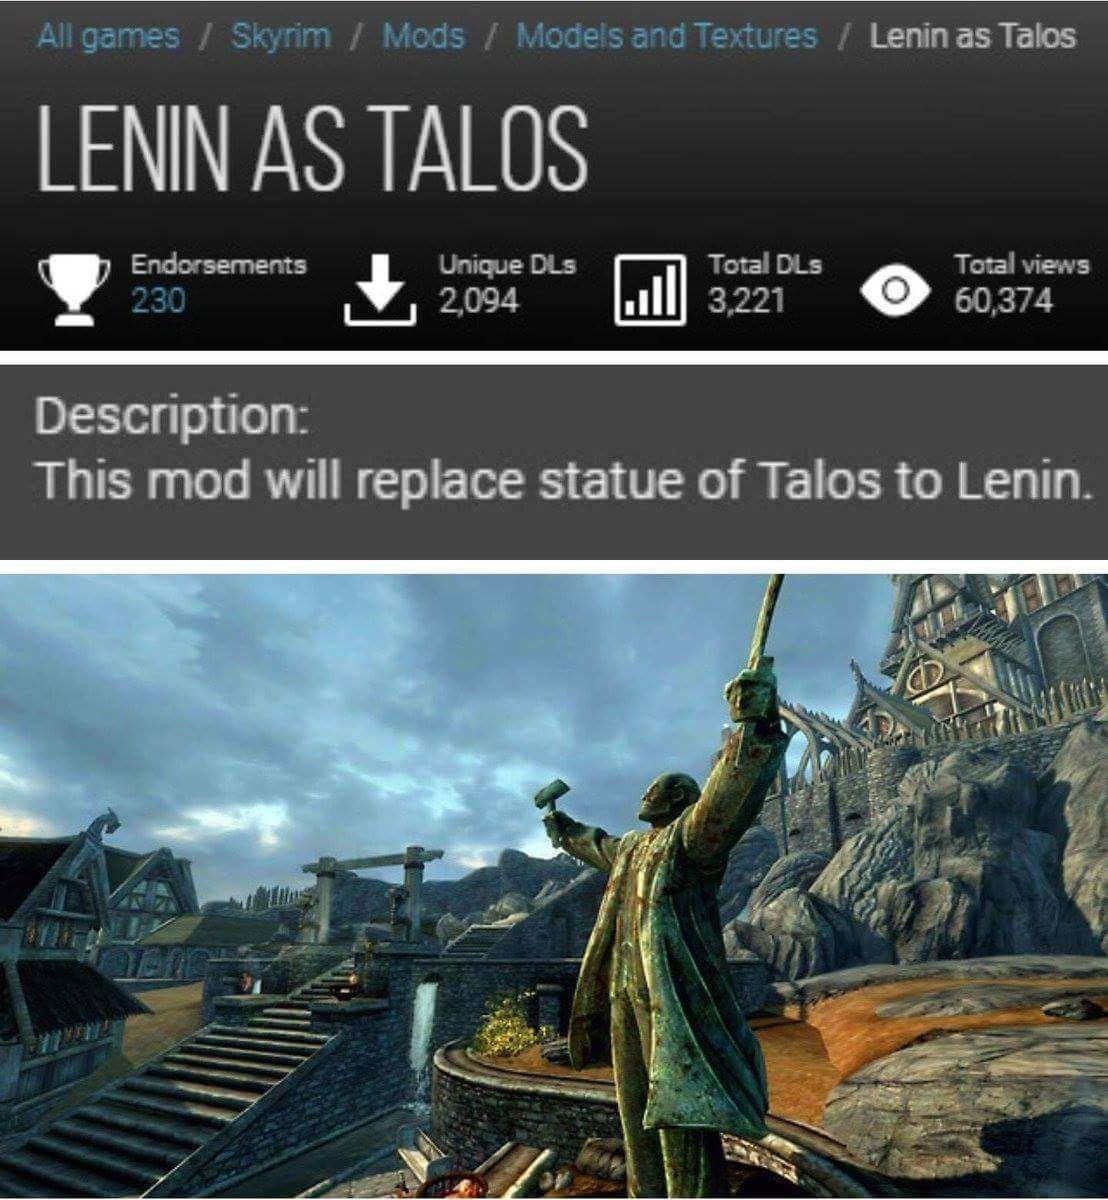 sykrim Communism Edition remastert 8k Hd